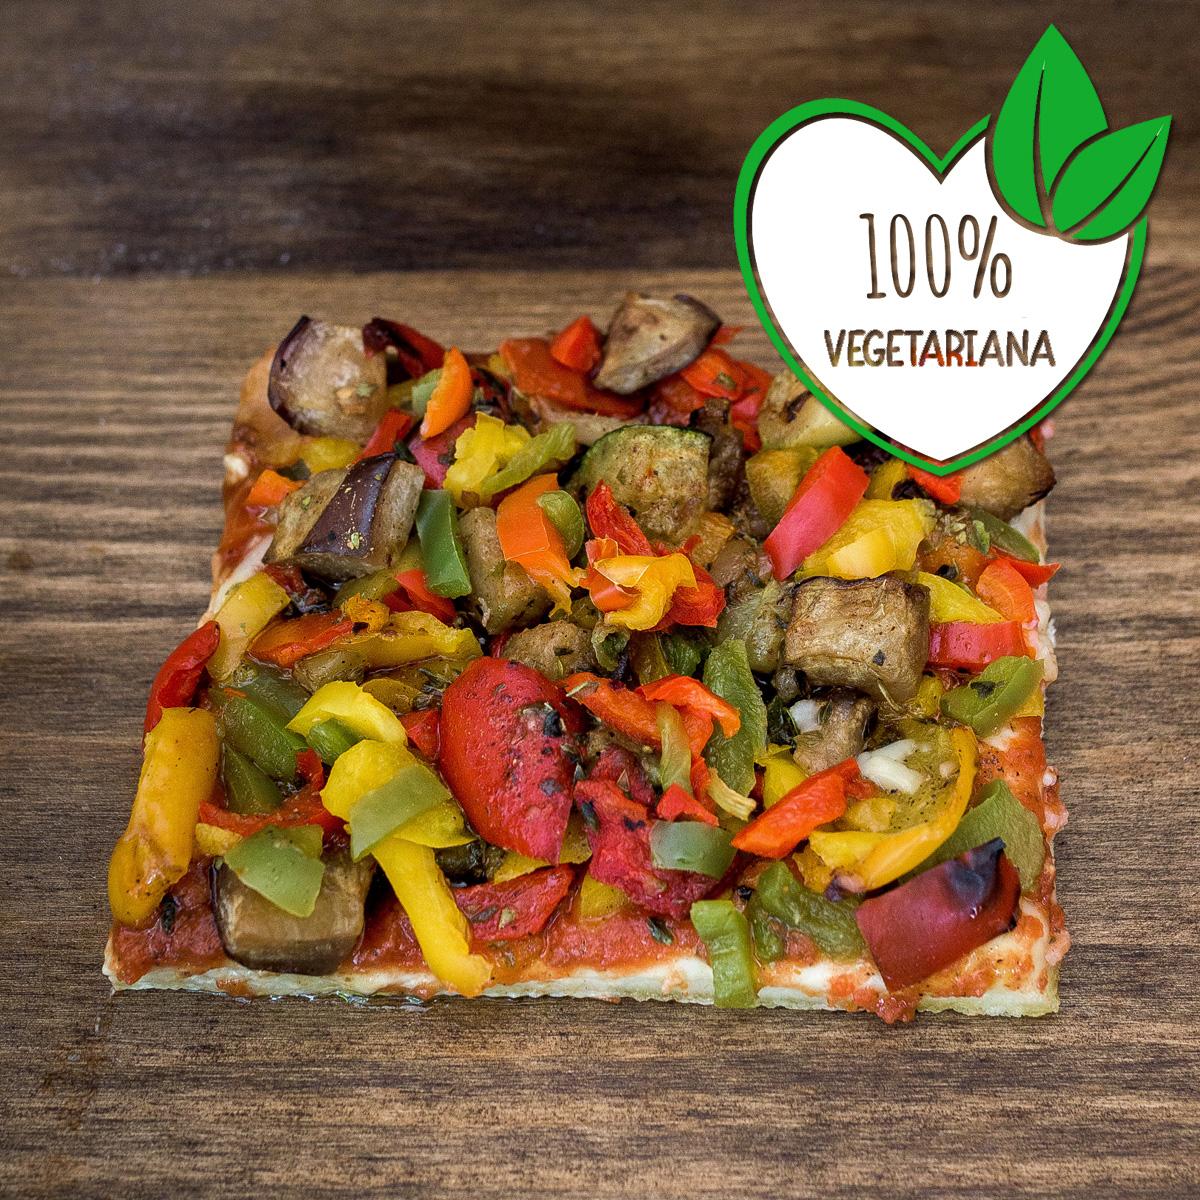 Pizzas Vegetarianas de Pizzone Zaragoza